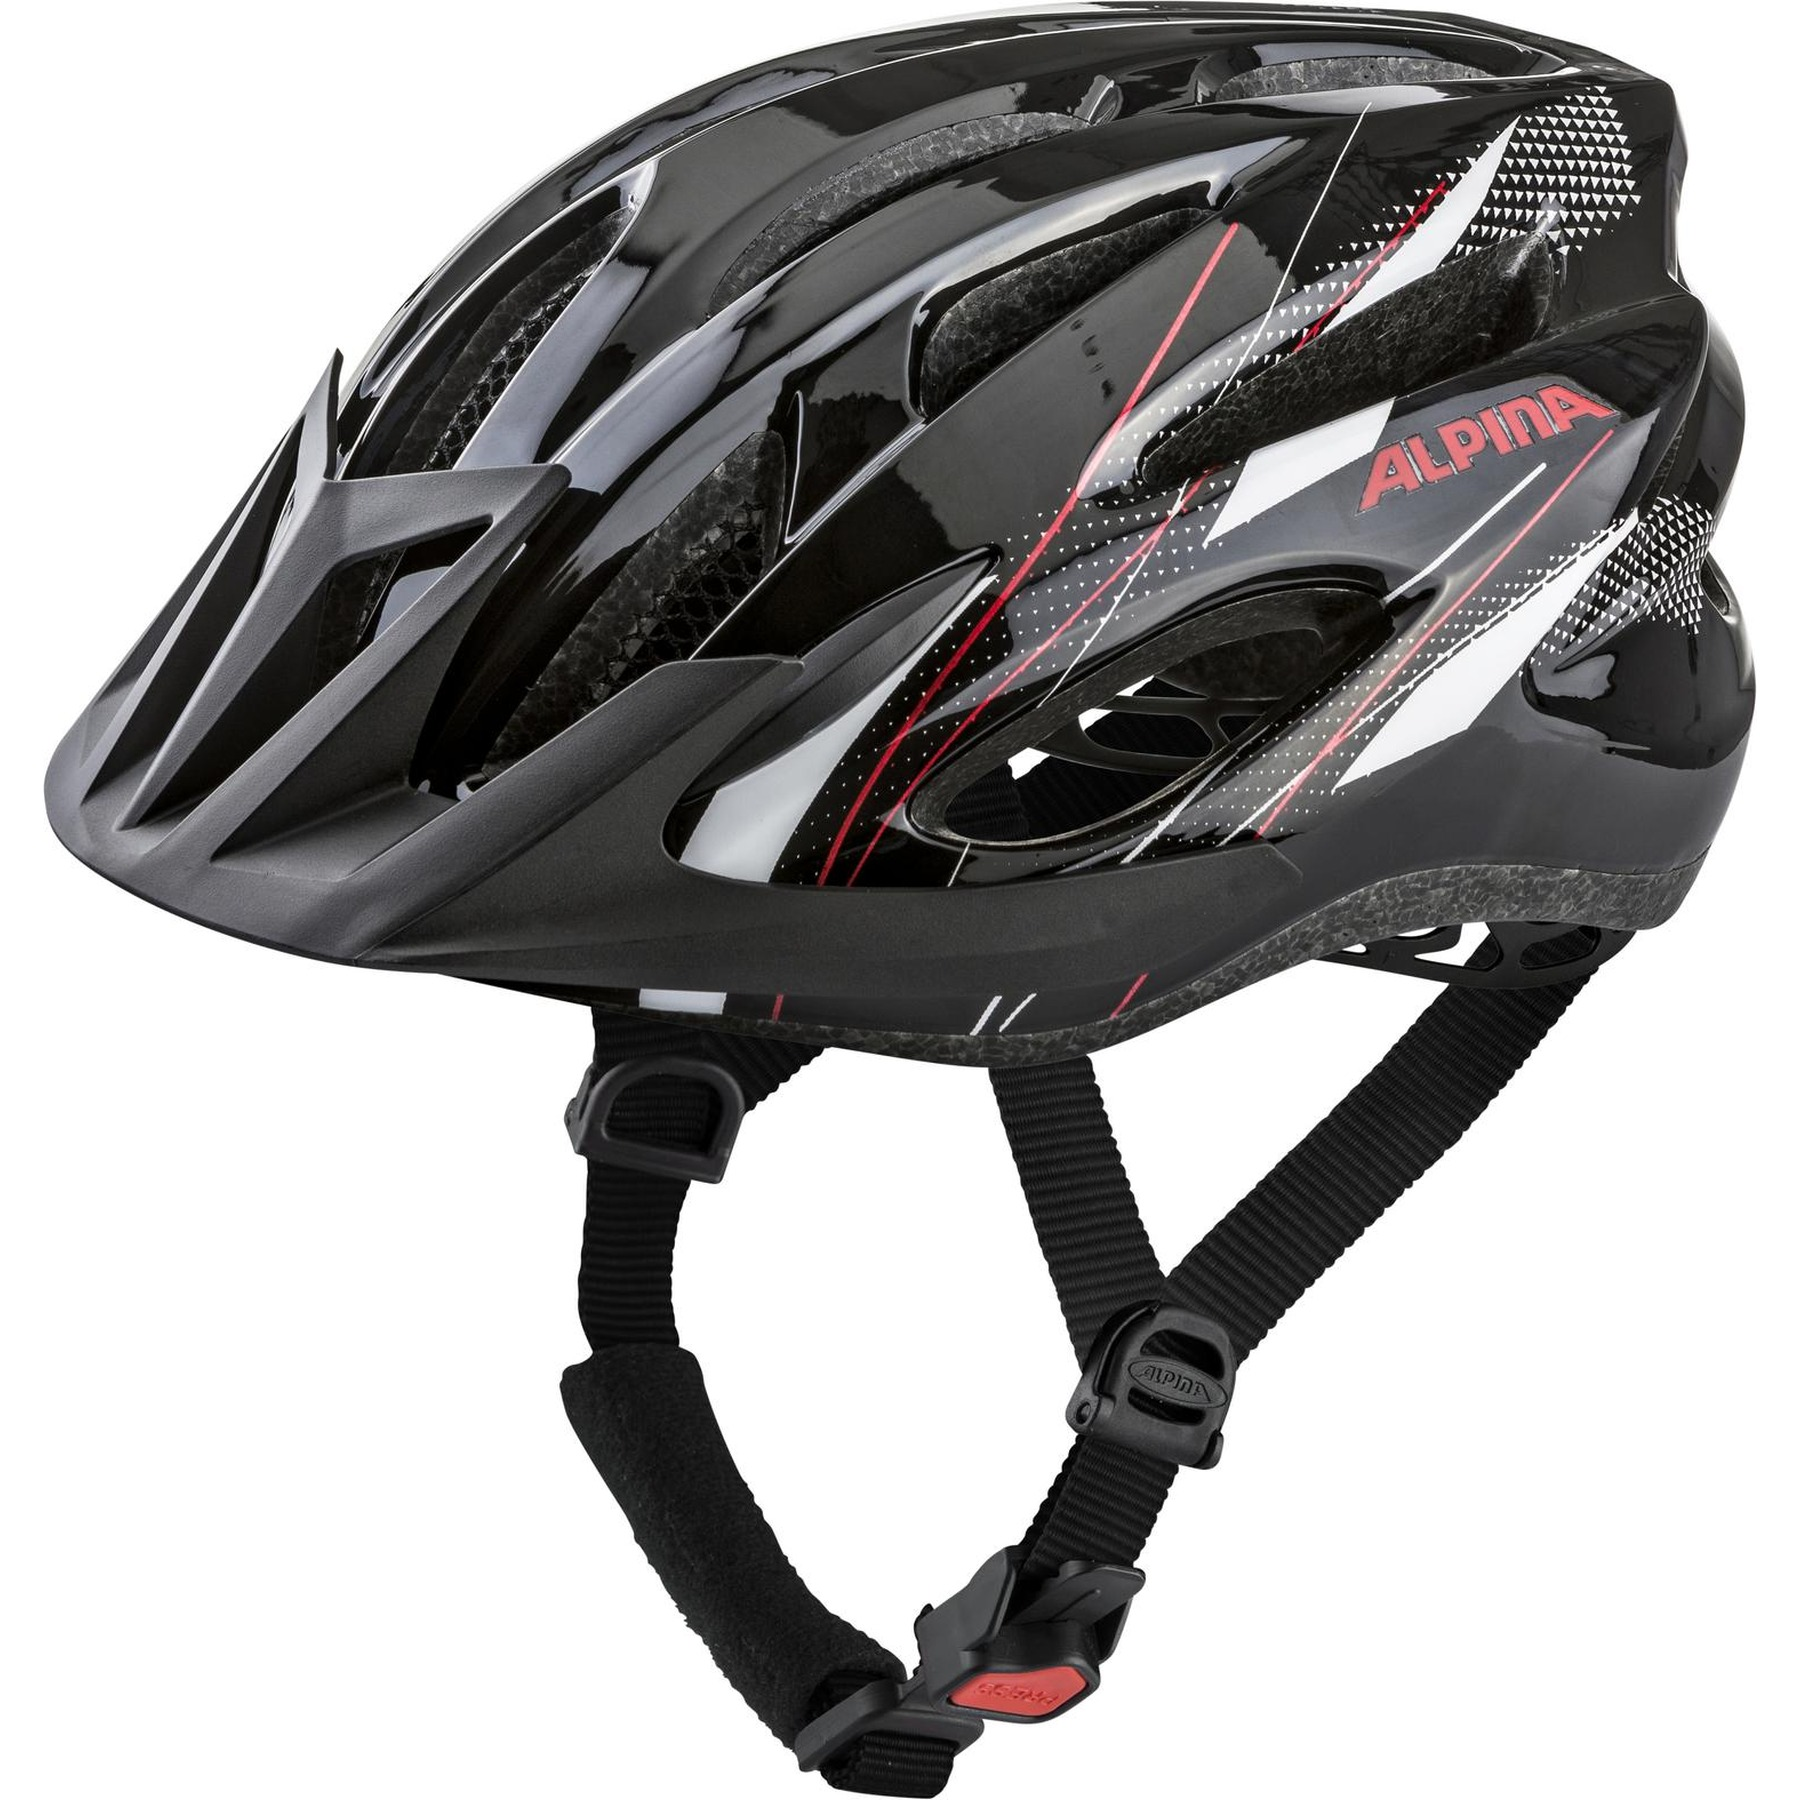 Alpina MTB 17 Helmet - black-white-red